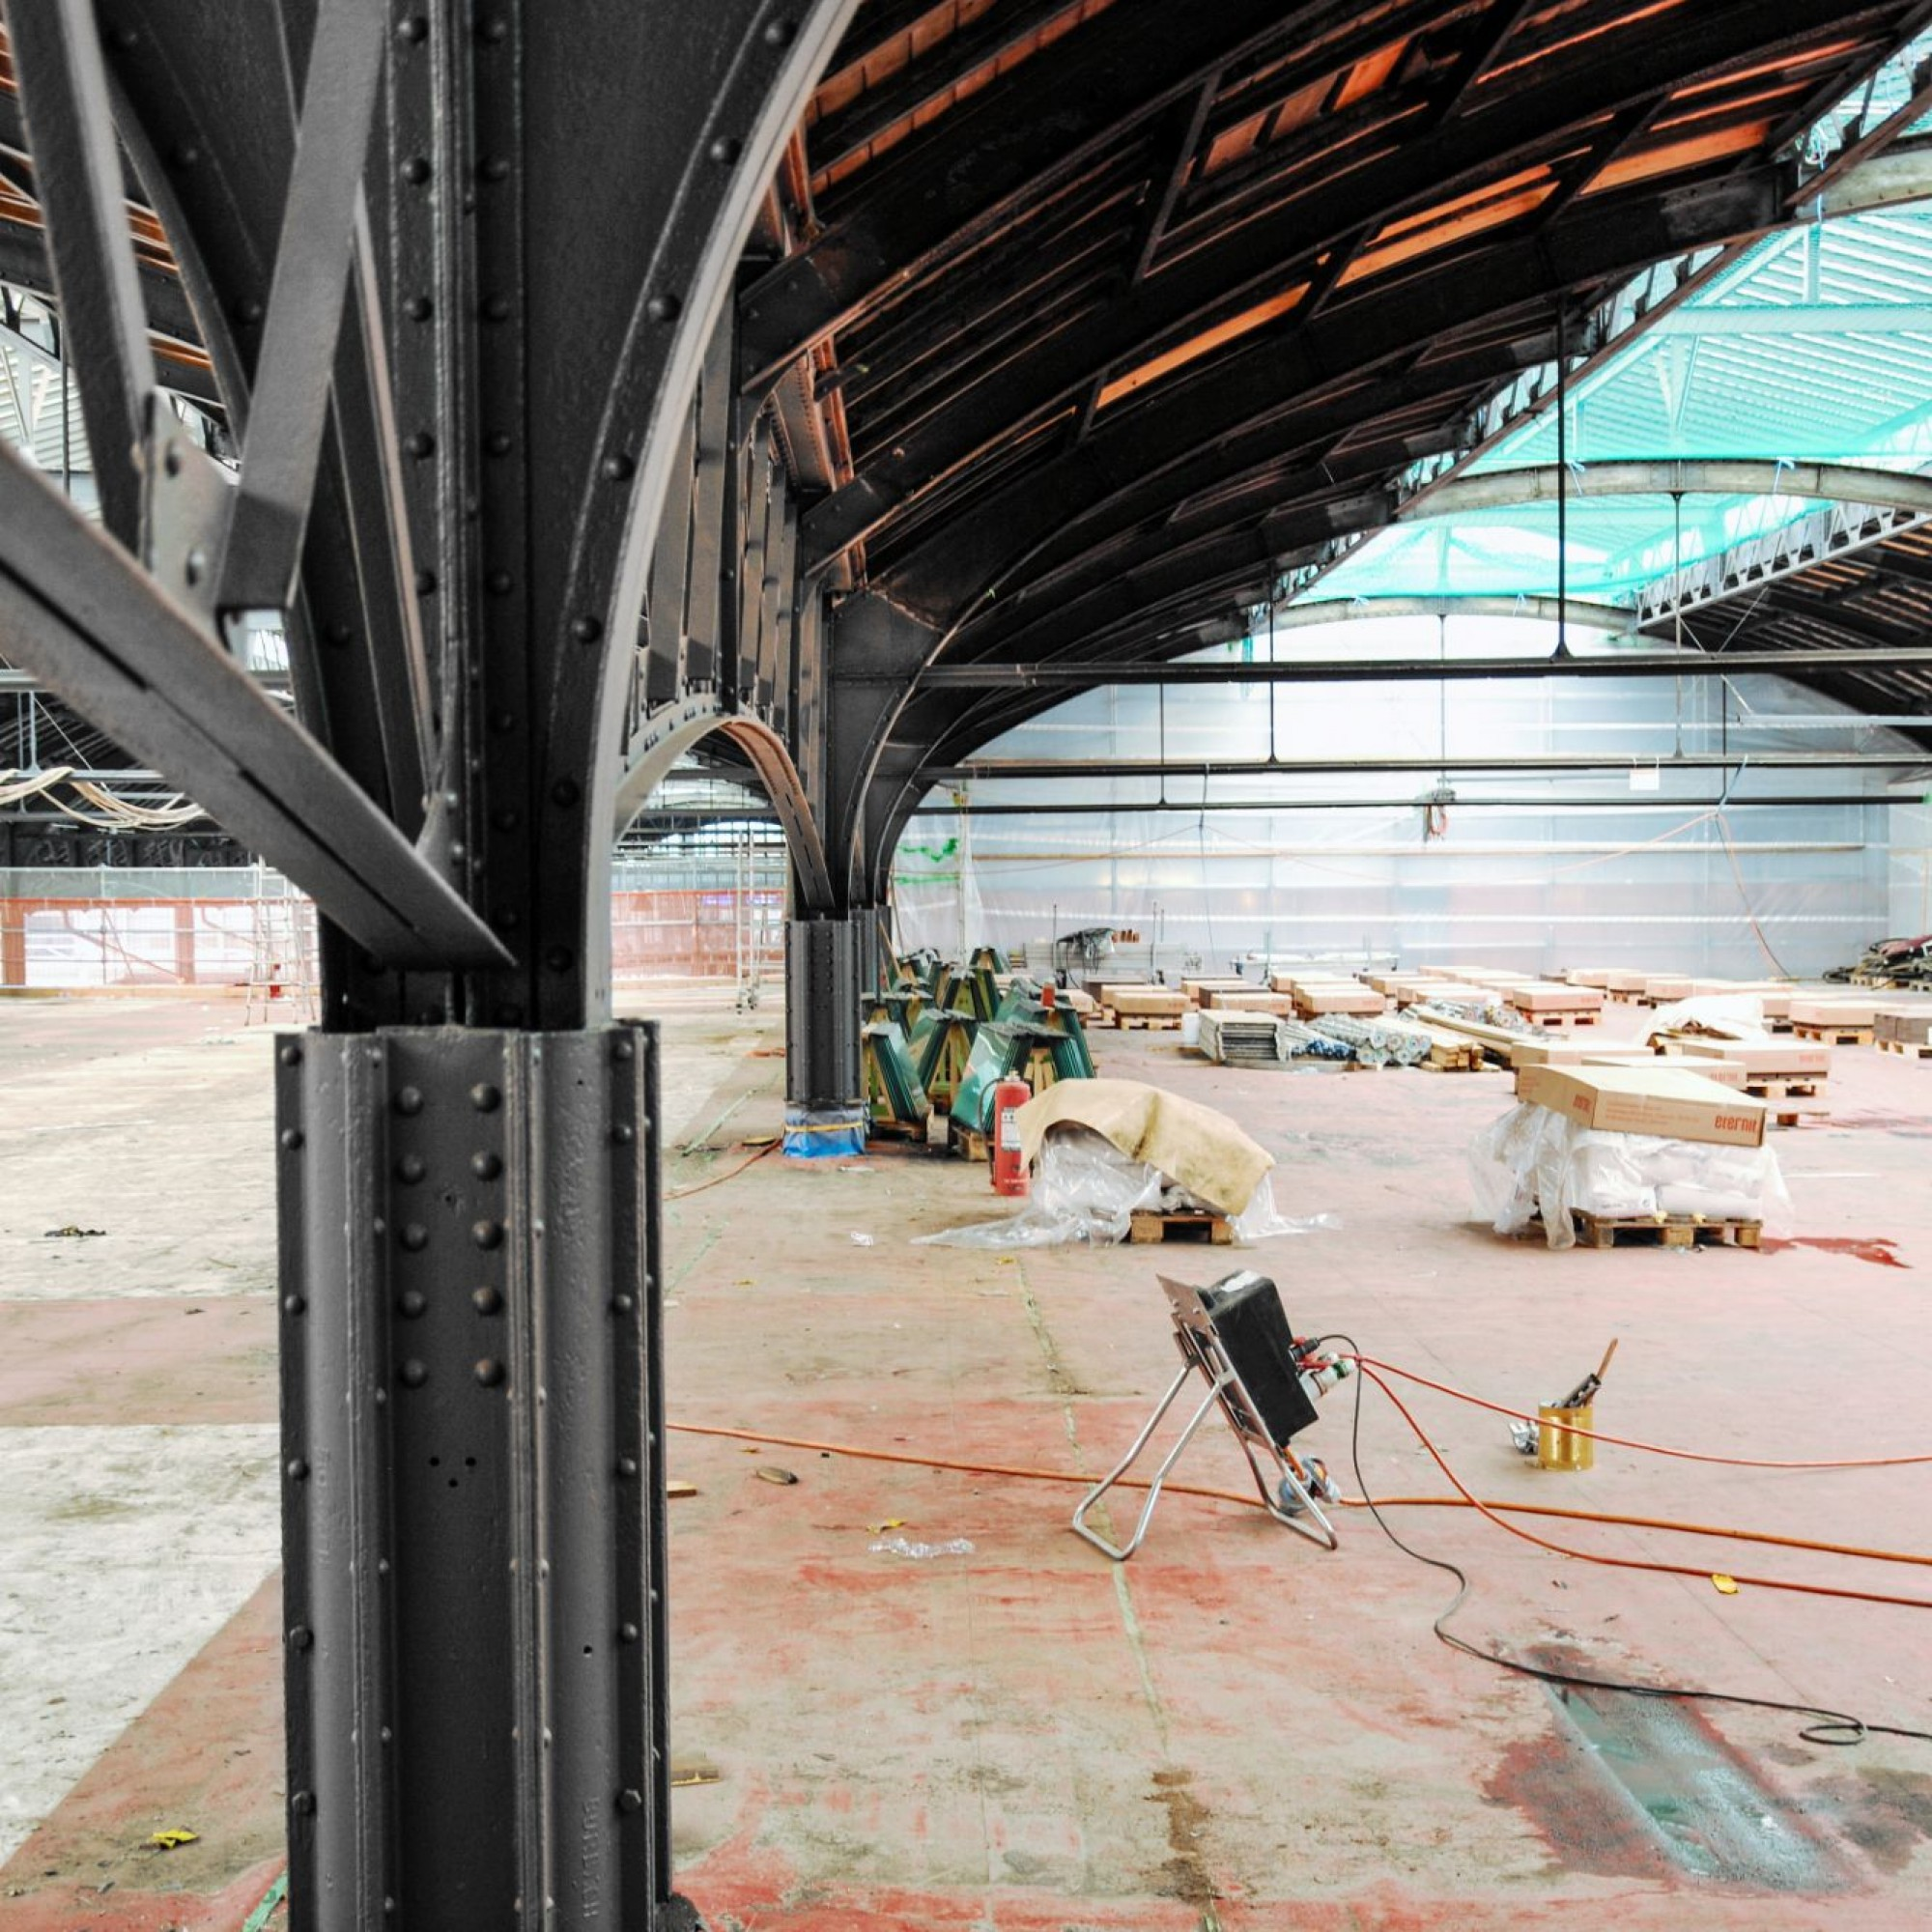 Baustelle zur Sanierung des Bahnhofs Basel SBB